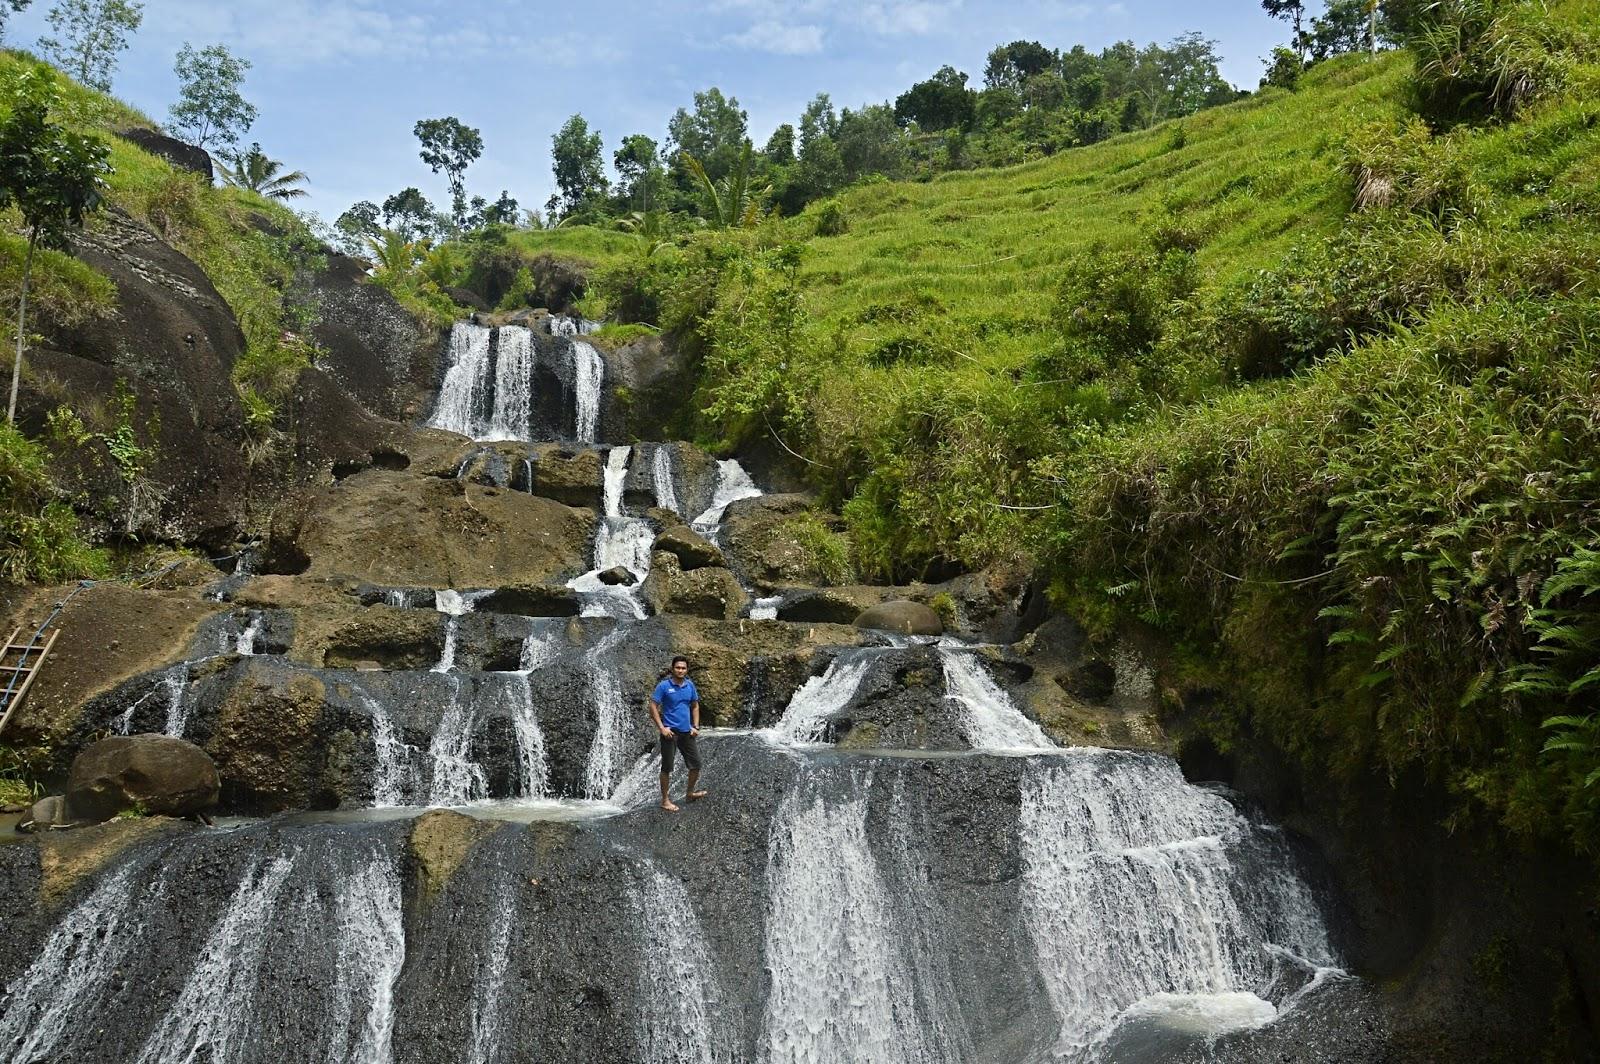 Yoga Shitghe Journey Kedung Kandang Lokasi Air Terjun Berada Dusun